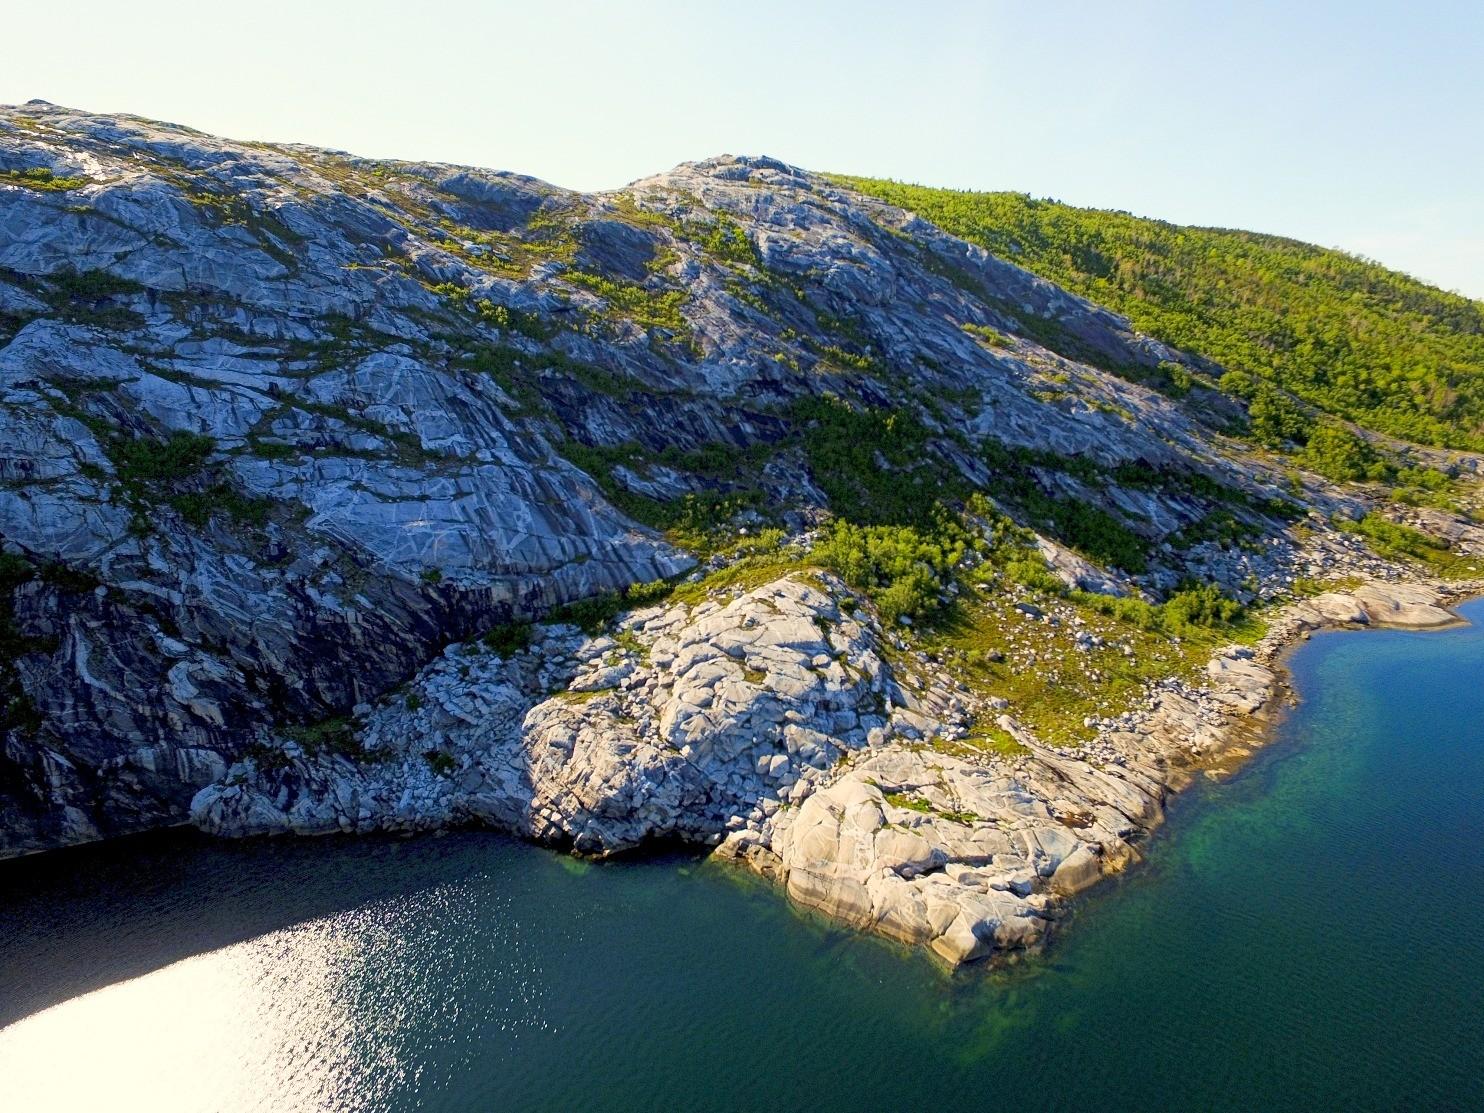 Trollhola Åseli Elvefjorden